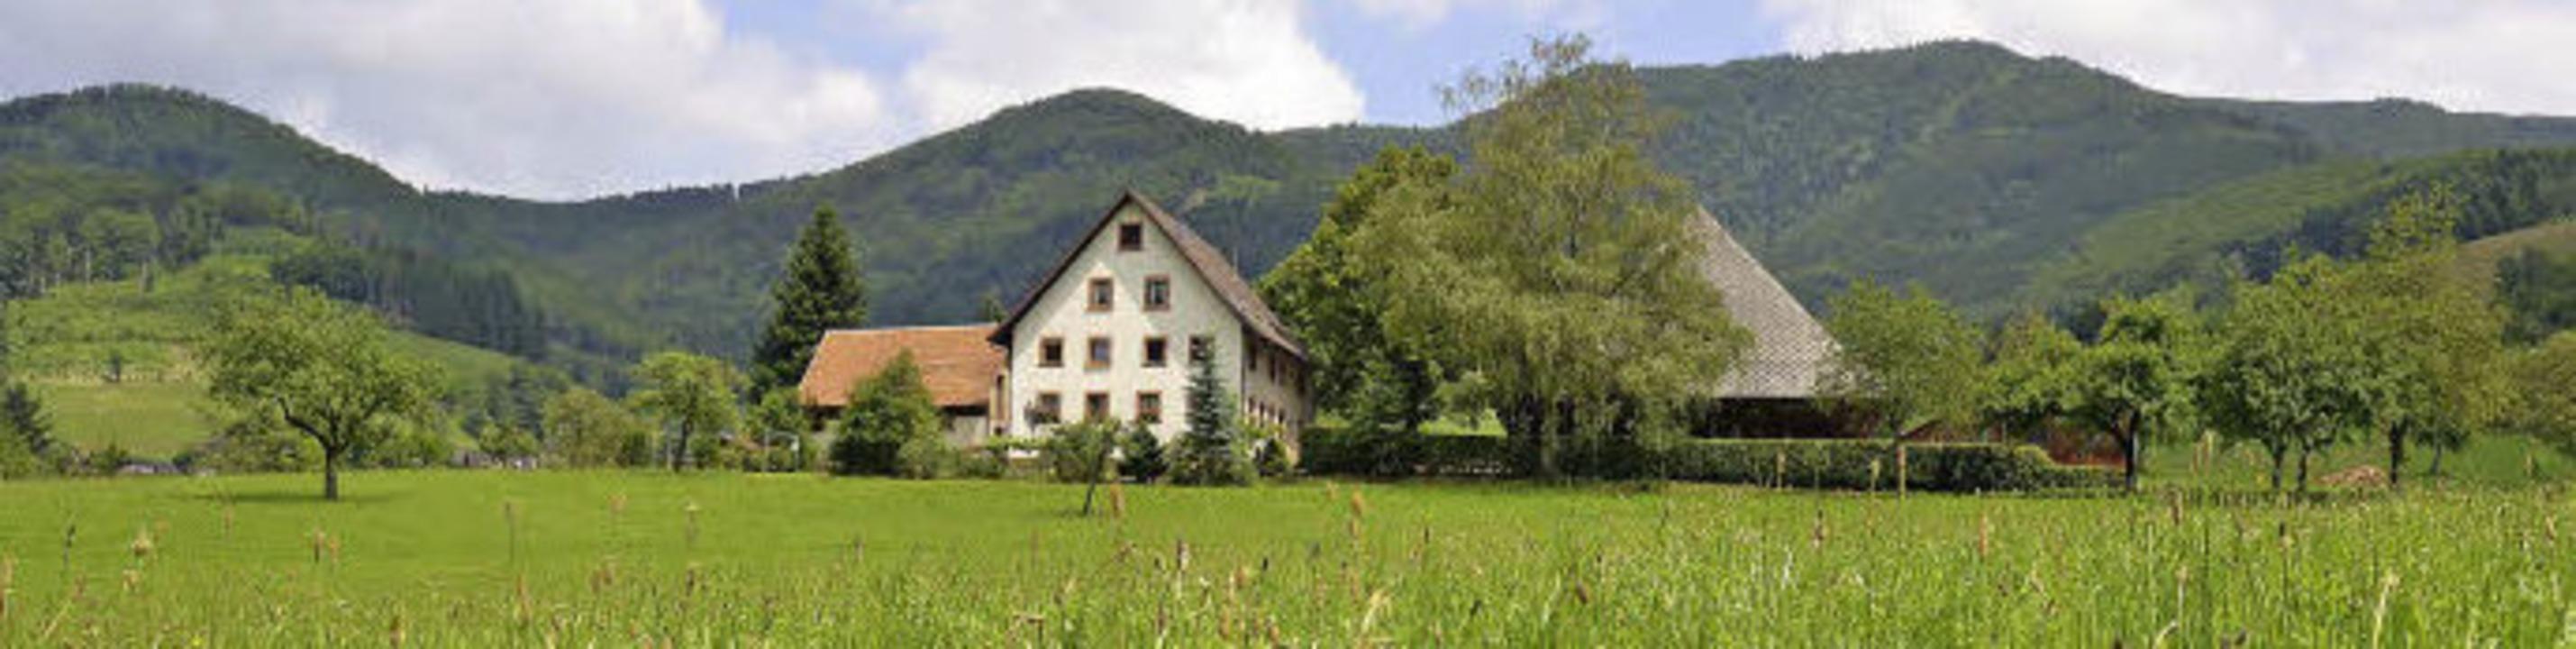 Schwarzwaldidyll im Oberglottertal: der Hofbauernhof   | Foto: Michael Bamberger/Birgit Herrmann/privat (2)